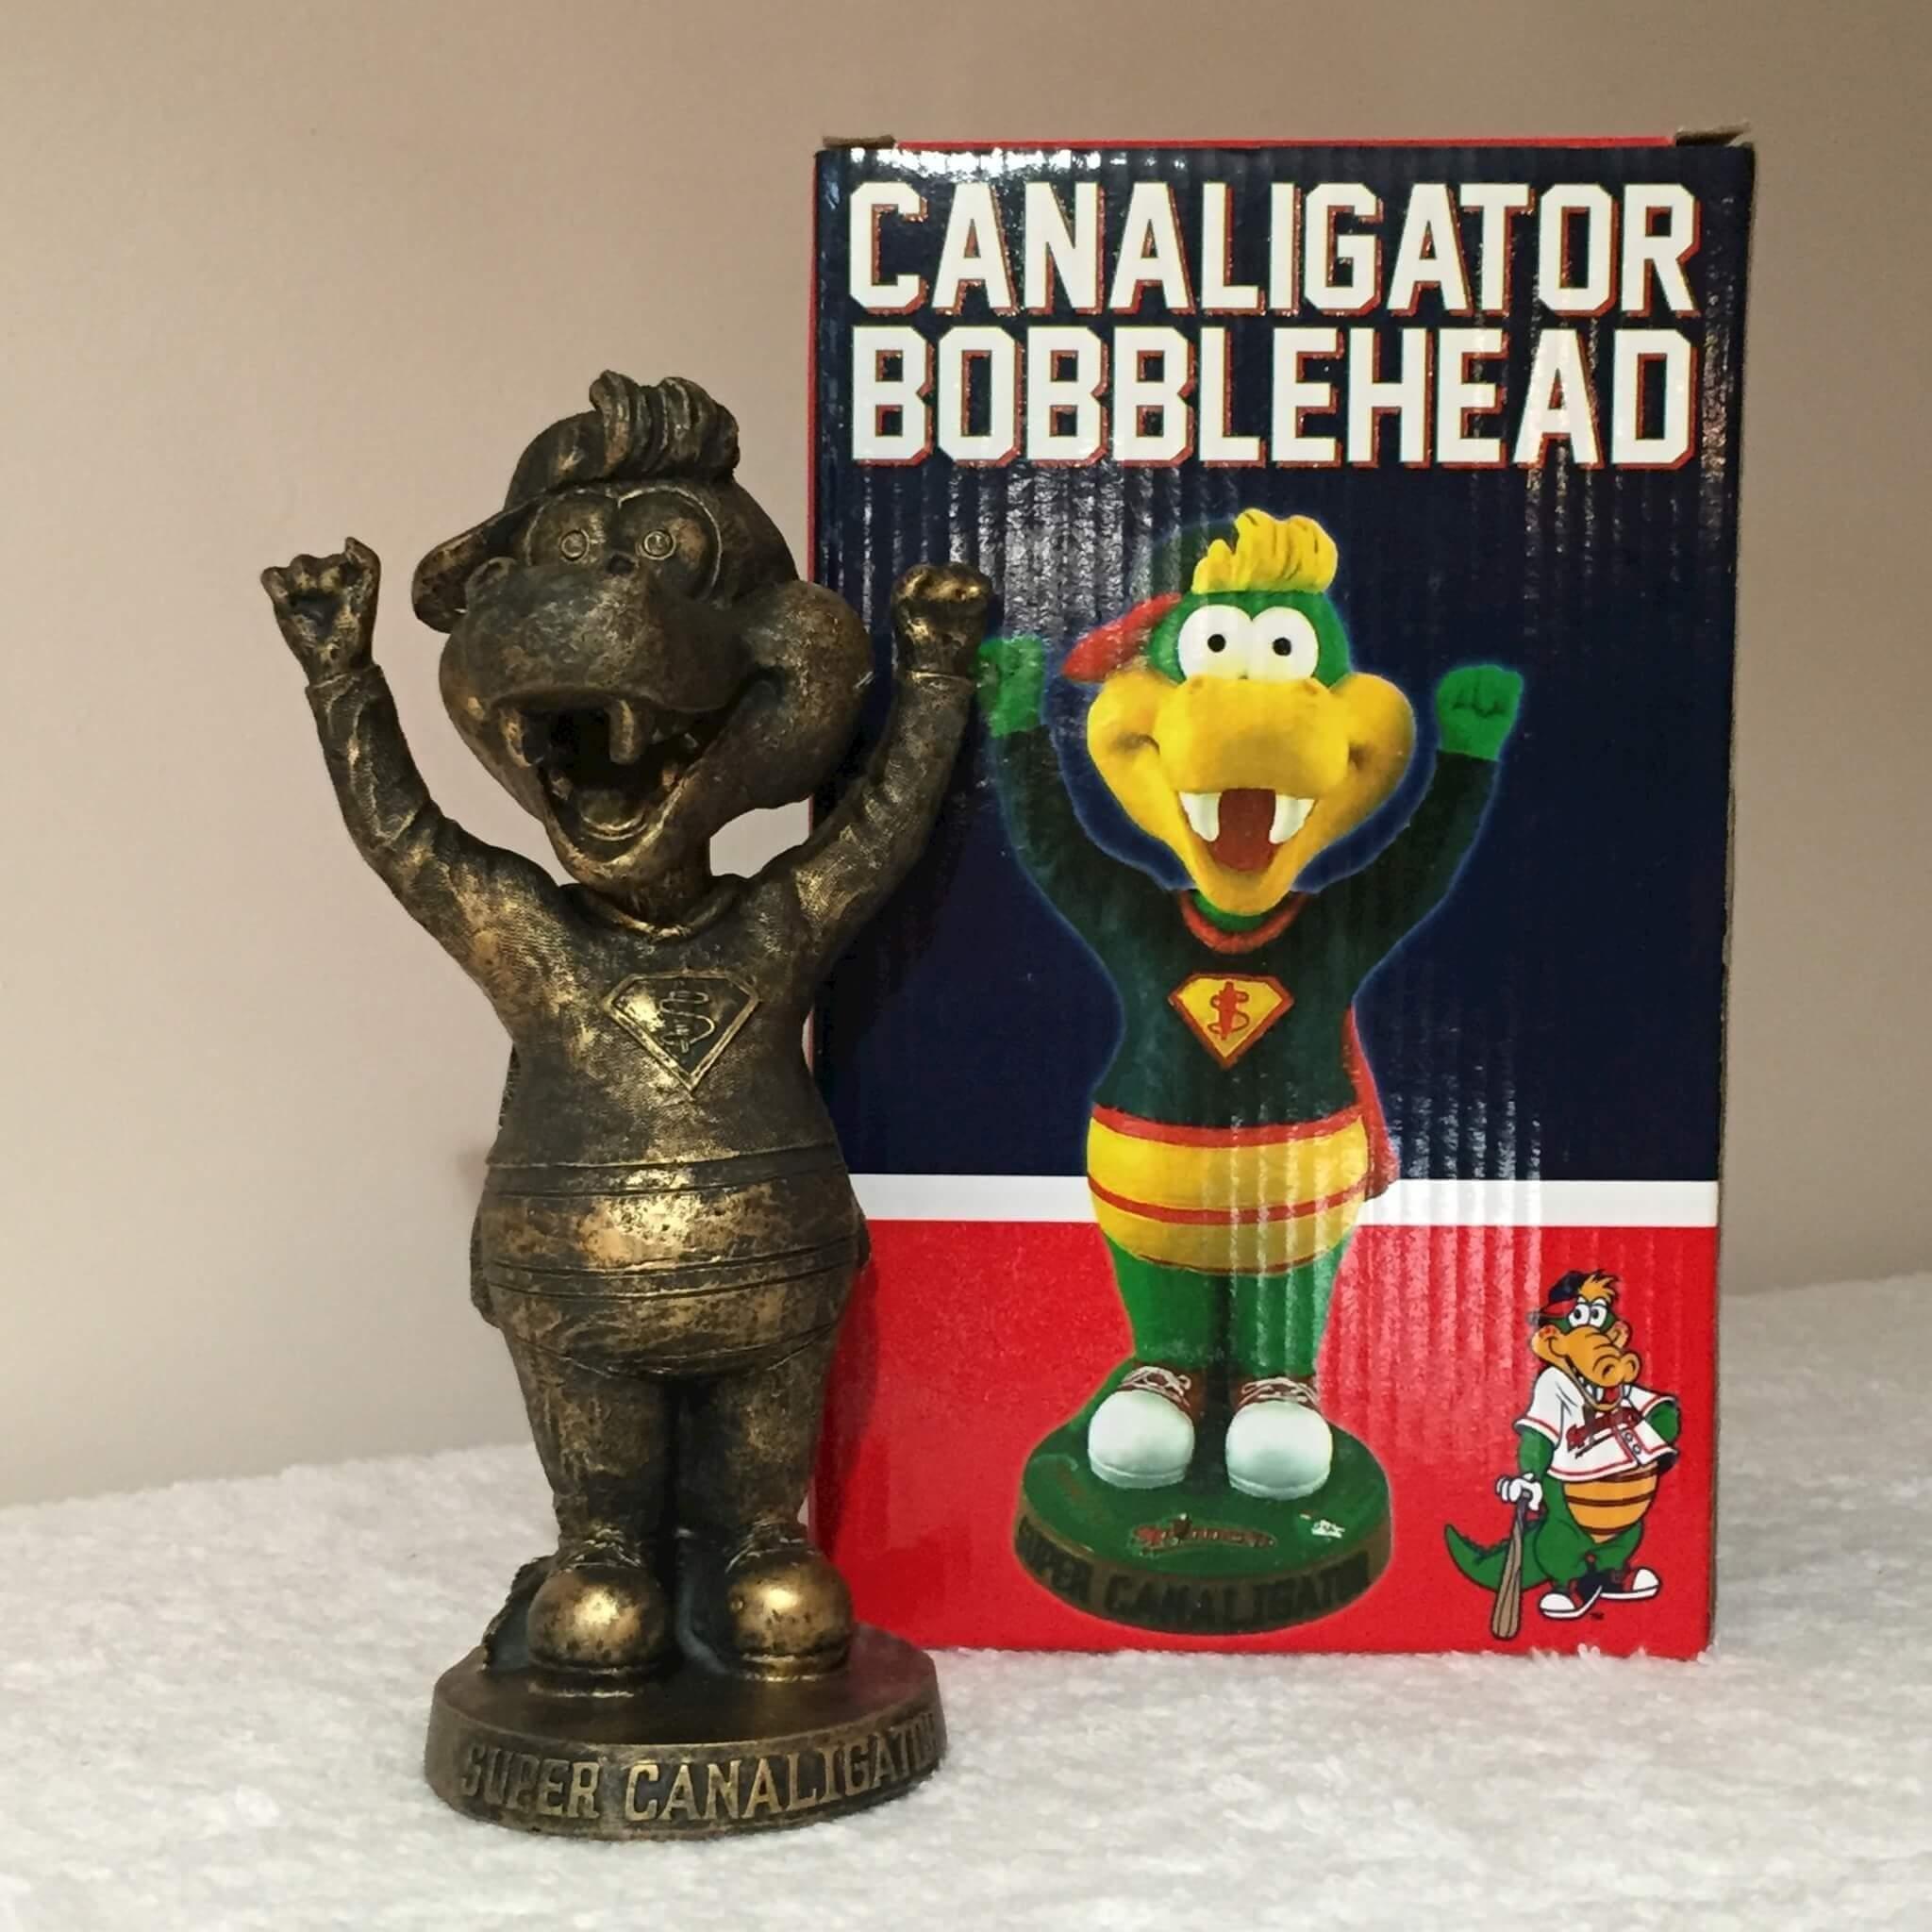 Canaligator